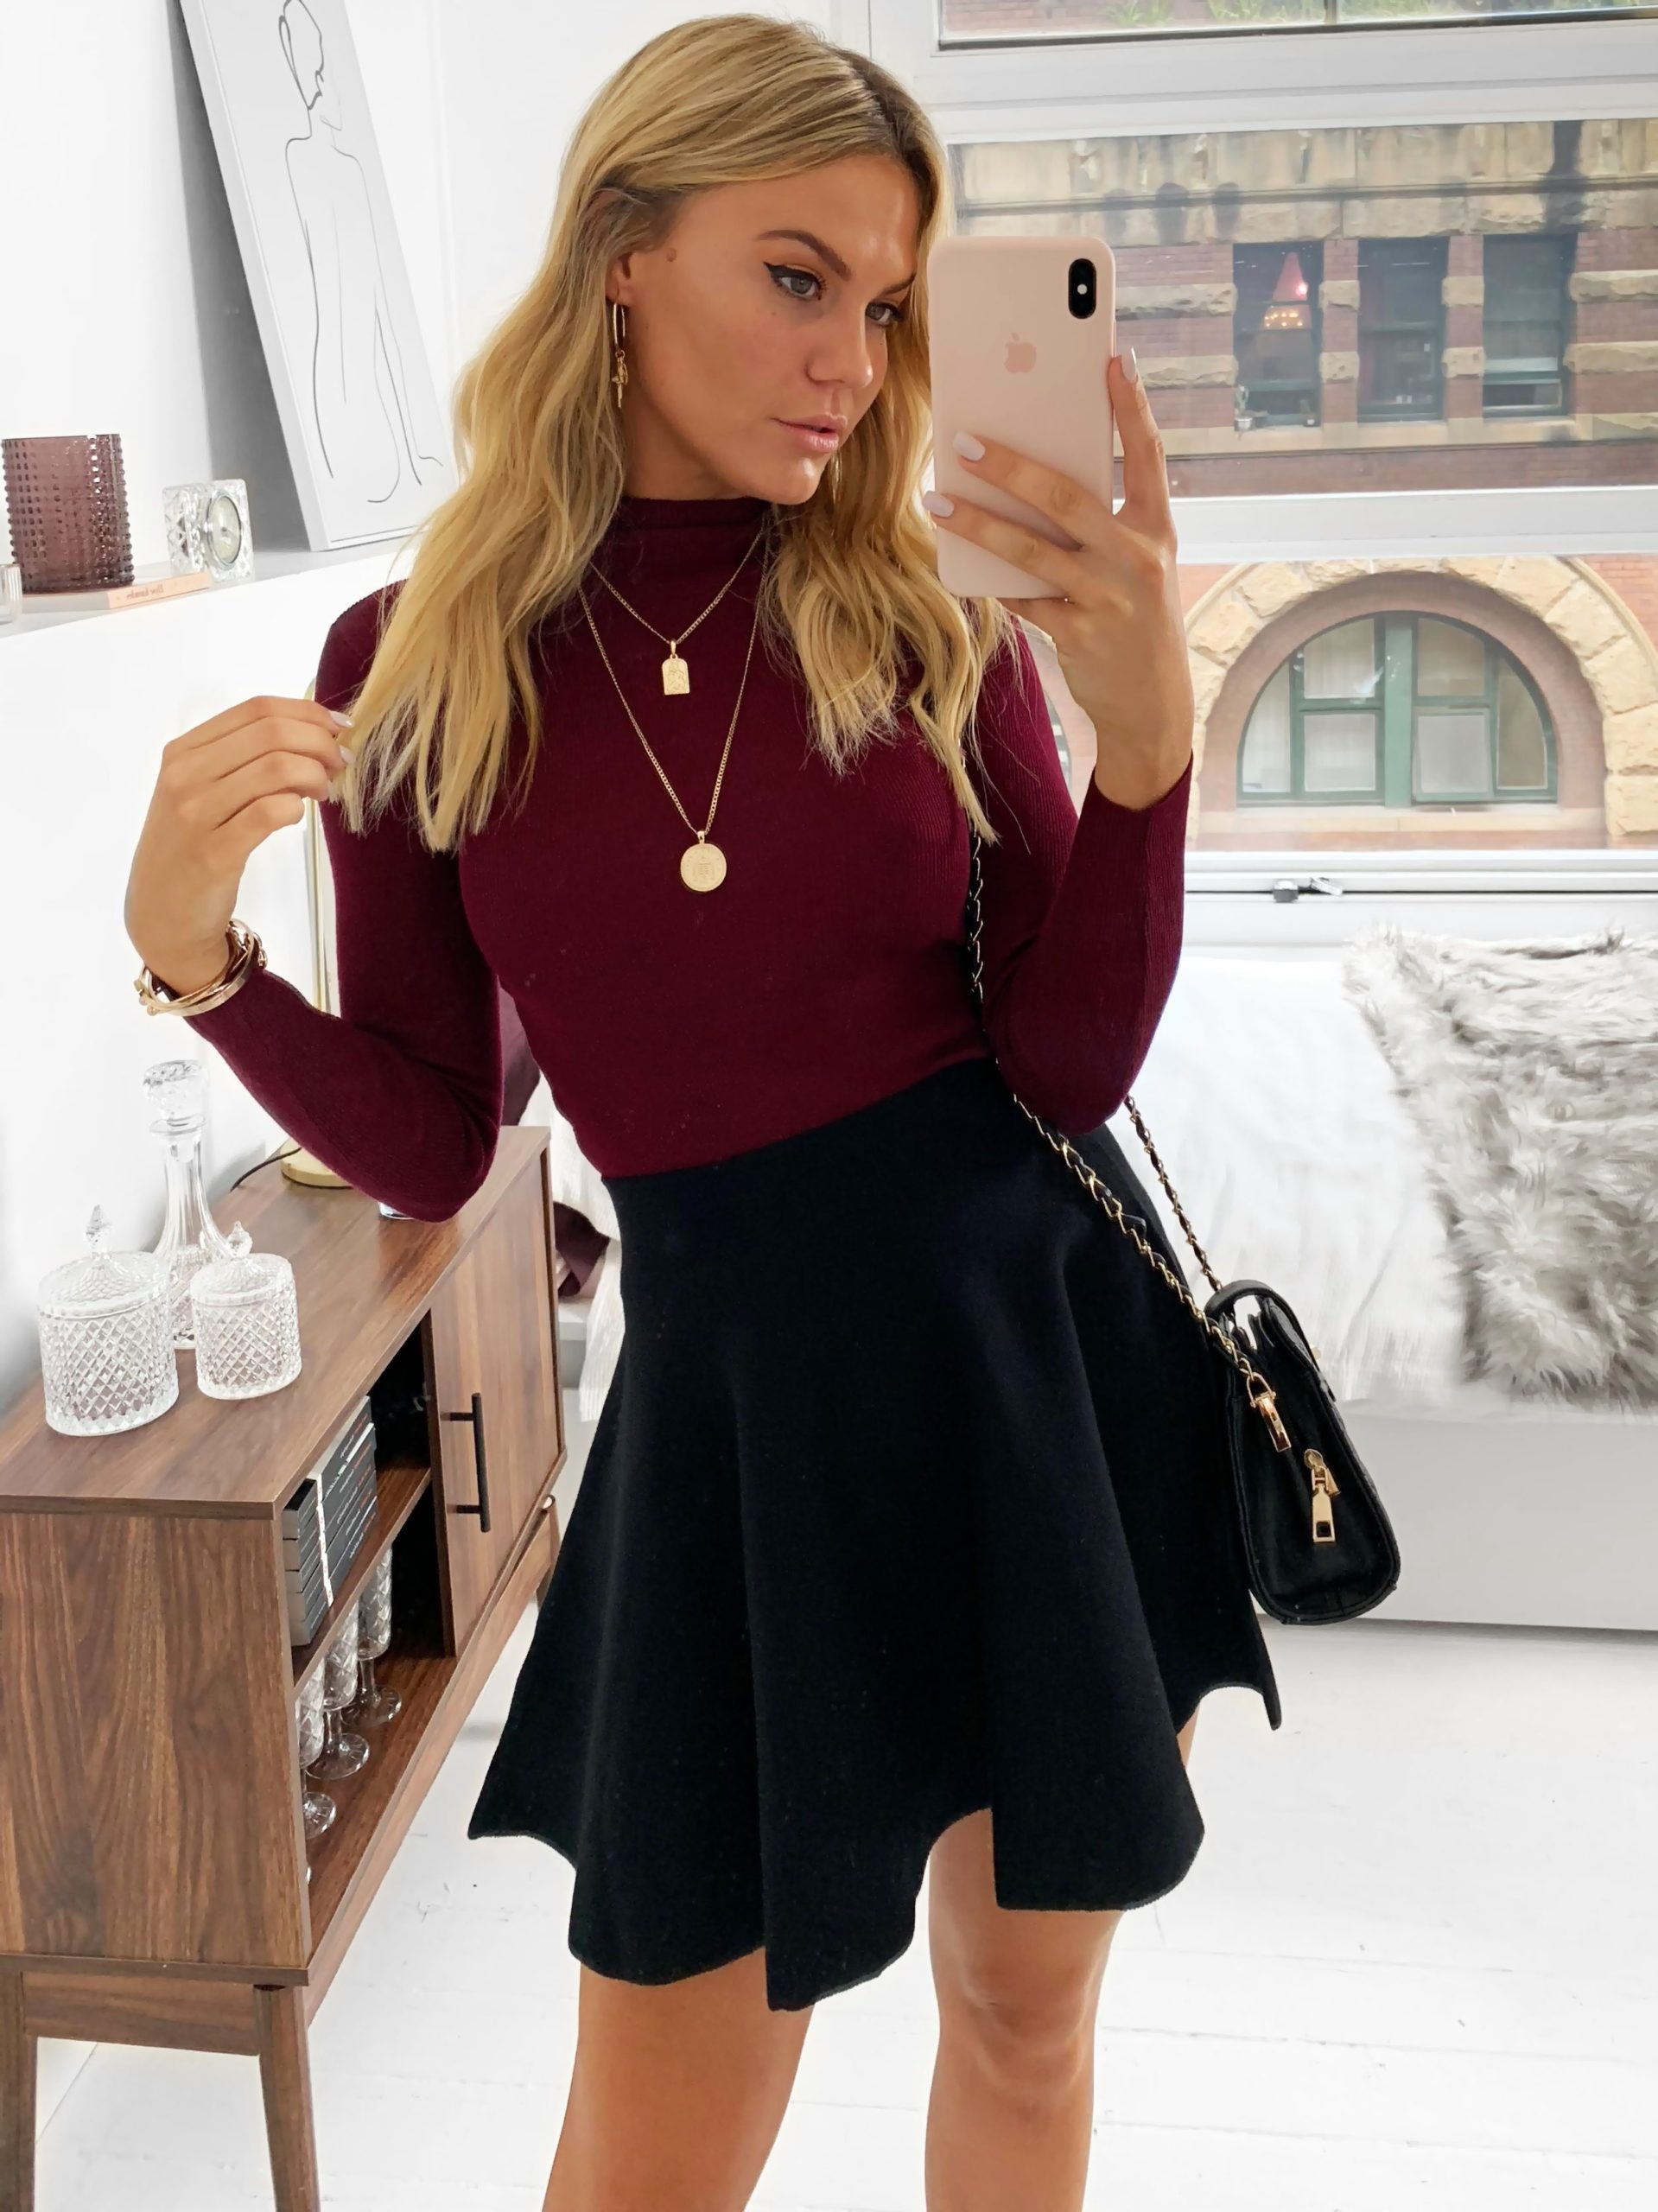 Work in a black skirt